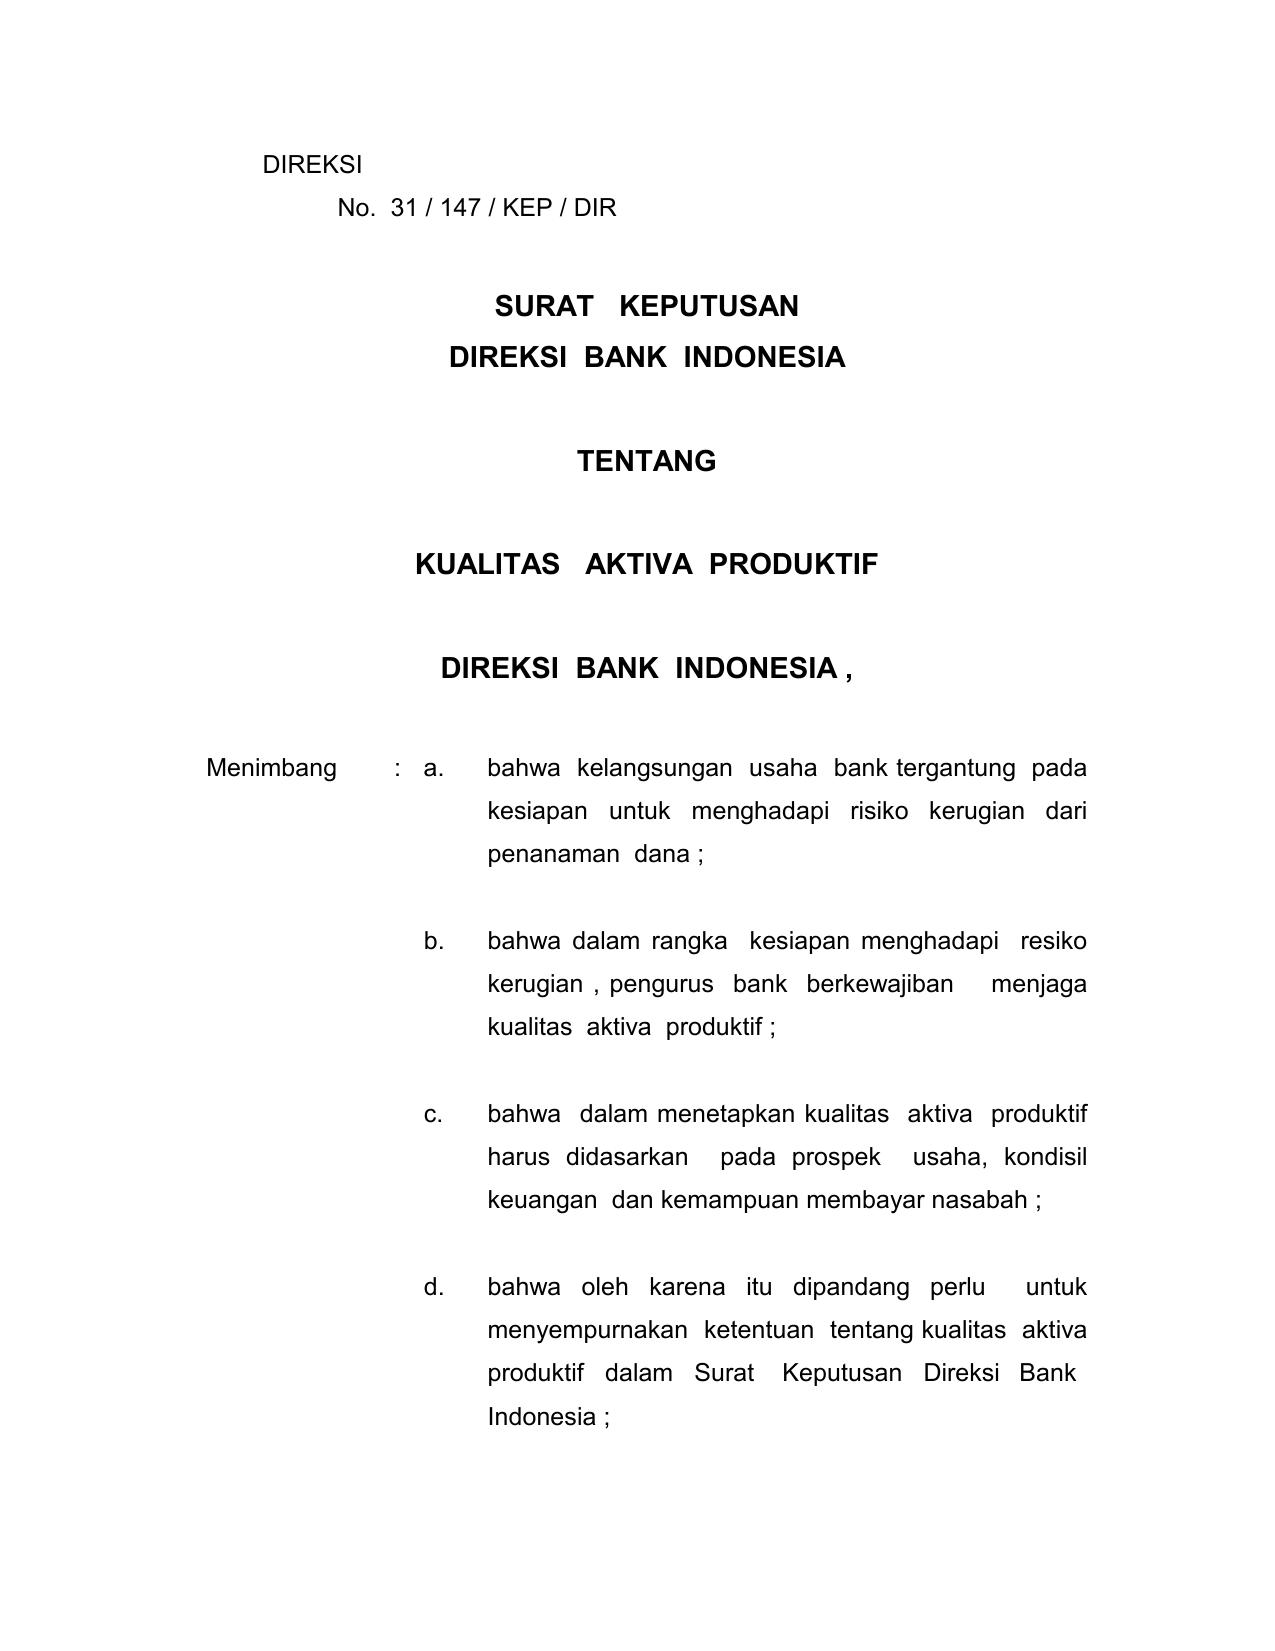 Surat Keputusan Direksi Bank Indonesia Tentang Kualitas Aktiva